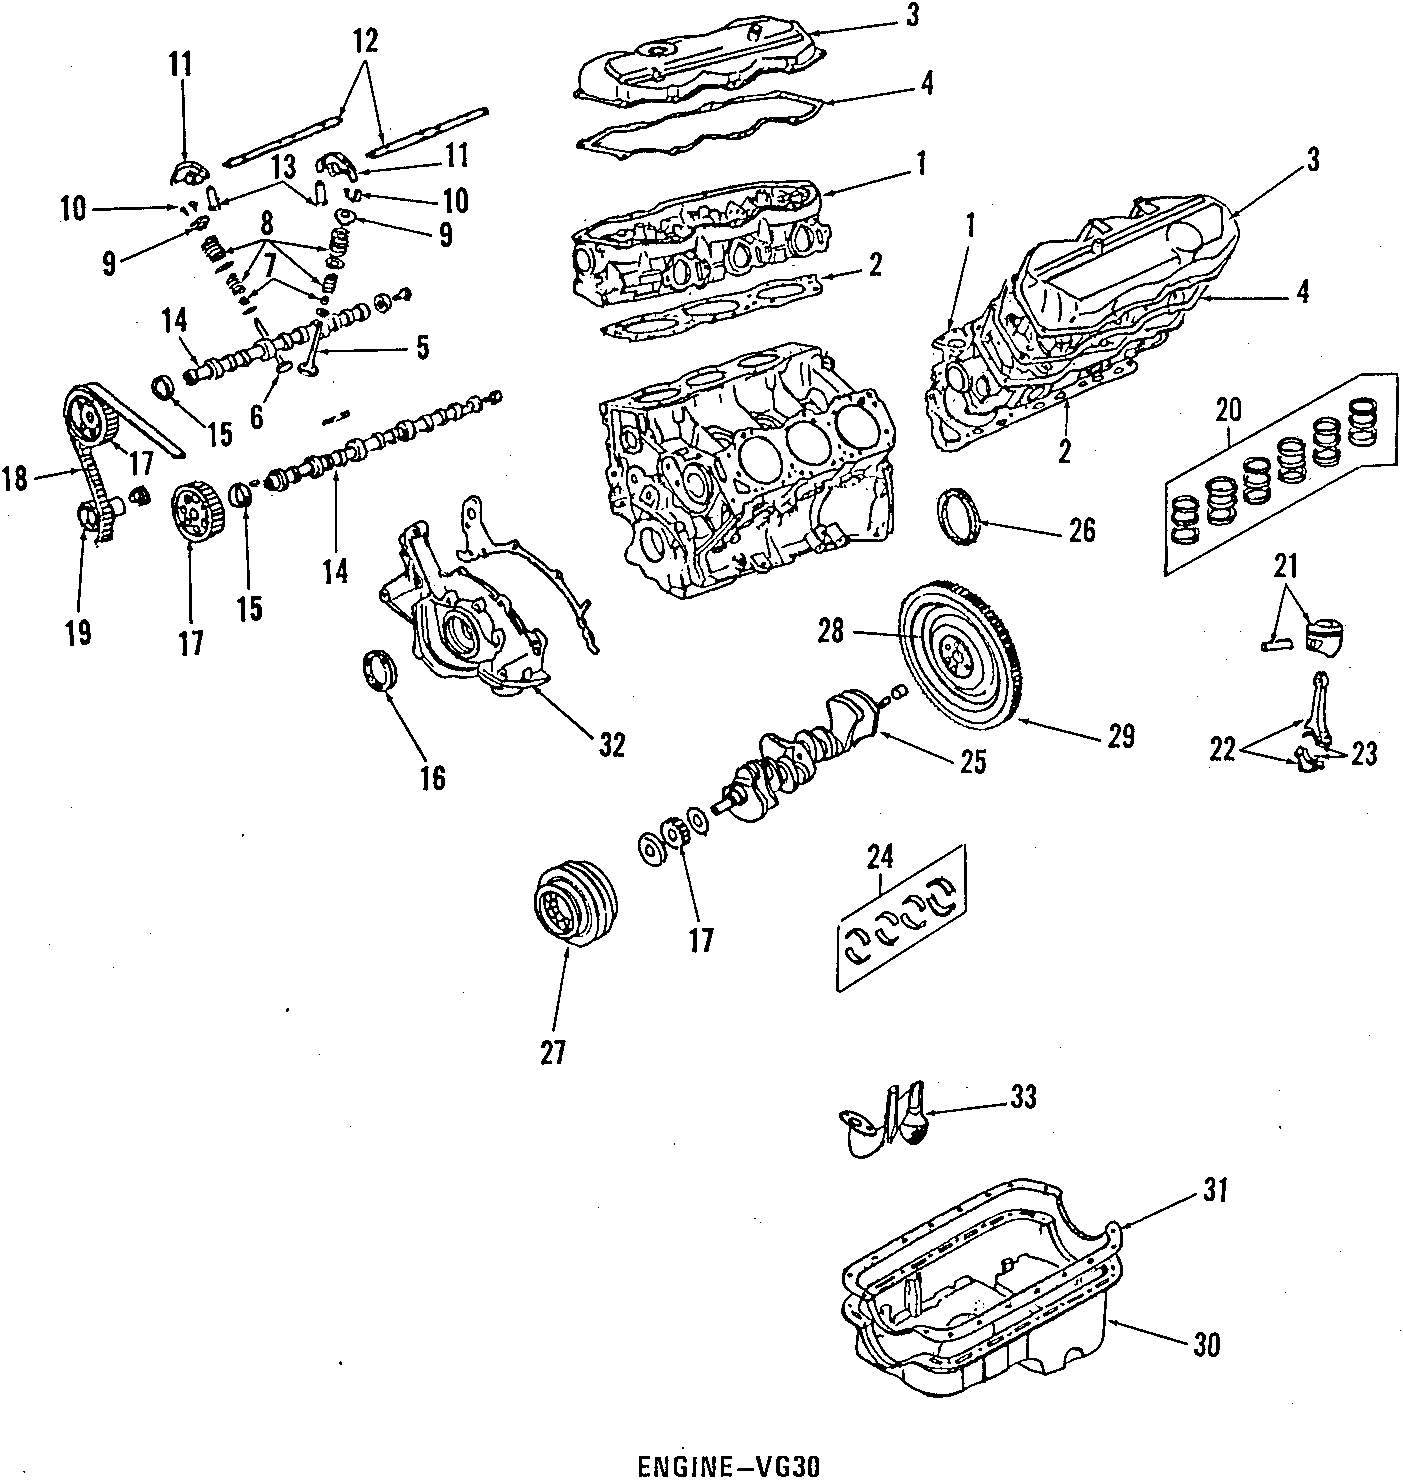 tags: #2005 nissan pathfinder exhaust diagram#nissan pathfinder exhaust  parts#2004 nissan pathfinder exhaust diagram#nissan maxima exhaust diagram#2003